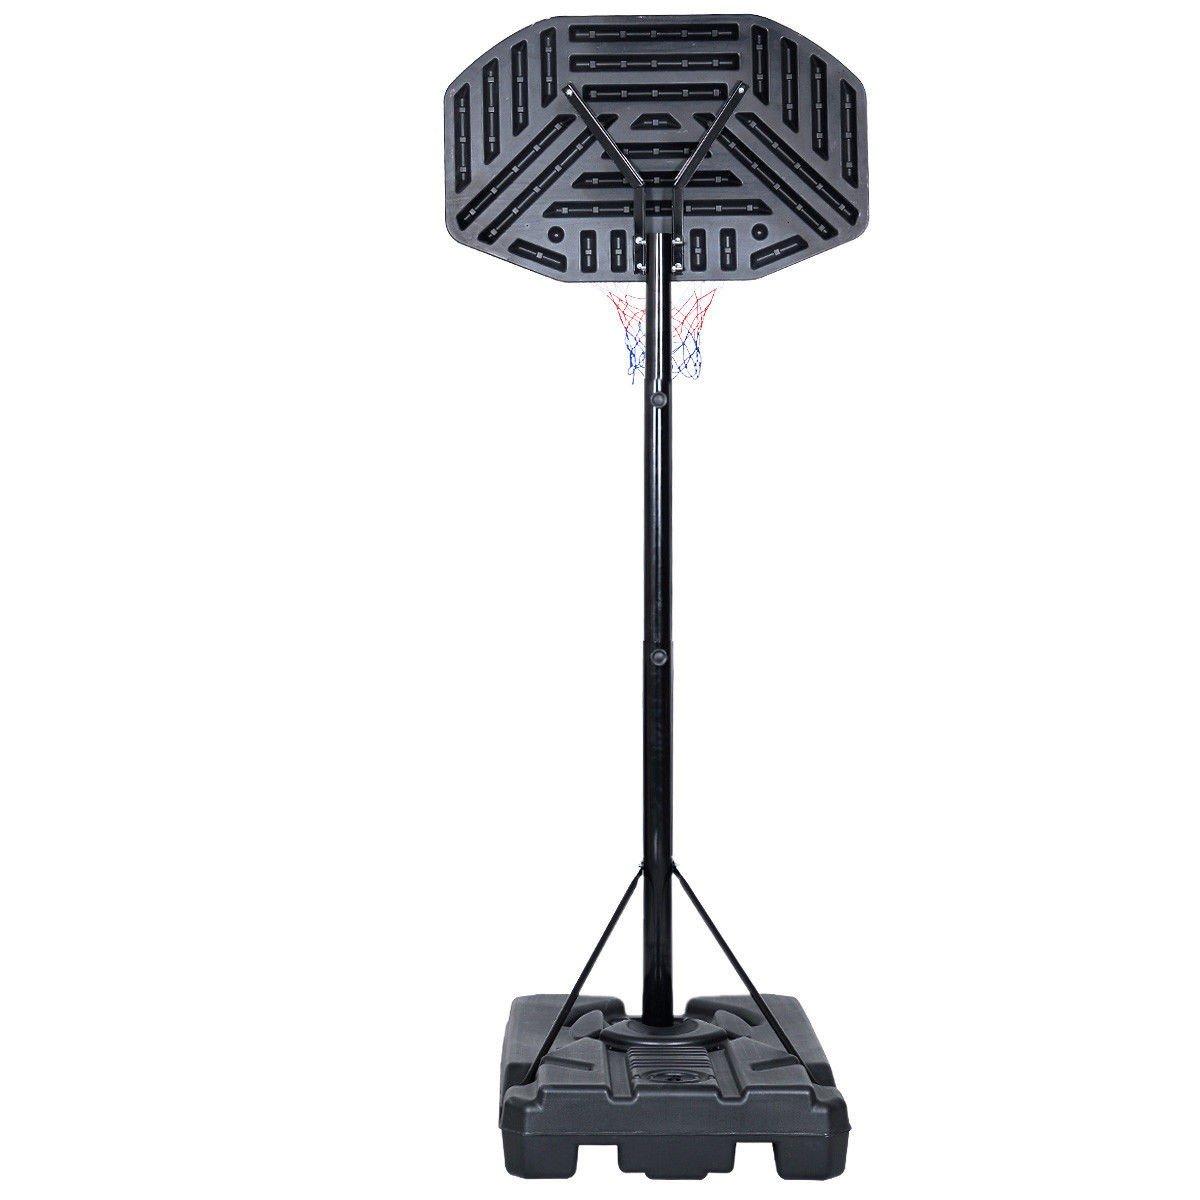 USA_BEST_SELLER Indoor Outdoor Adjustable Height Basketball Hoop Backboard with Wheels by USA_BEST_SELLER (Image #3)